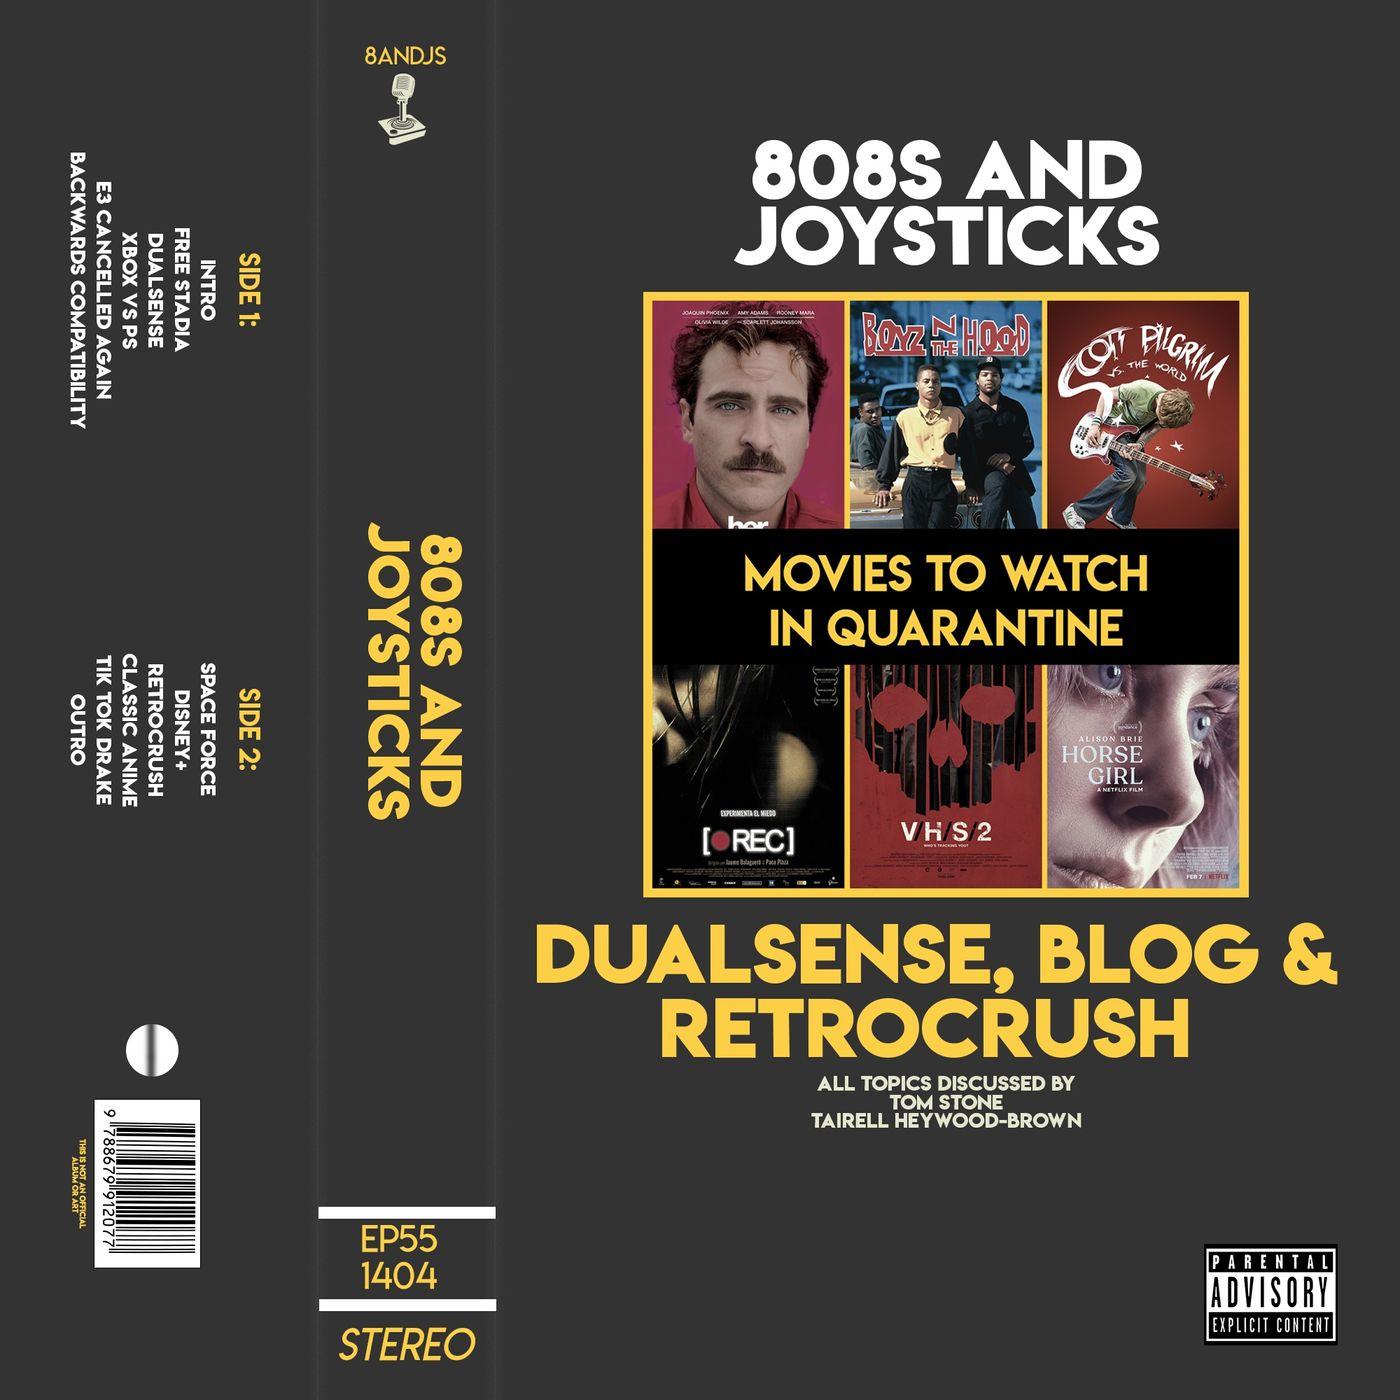 Episode 55: DualSense, RetroCrush and Our Blog Launch